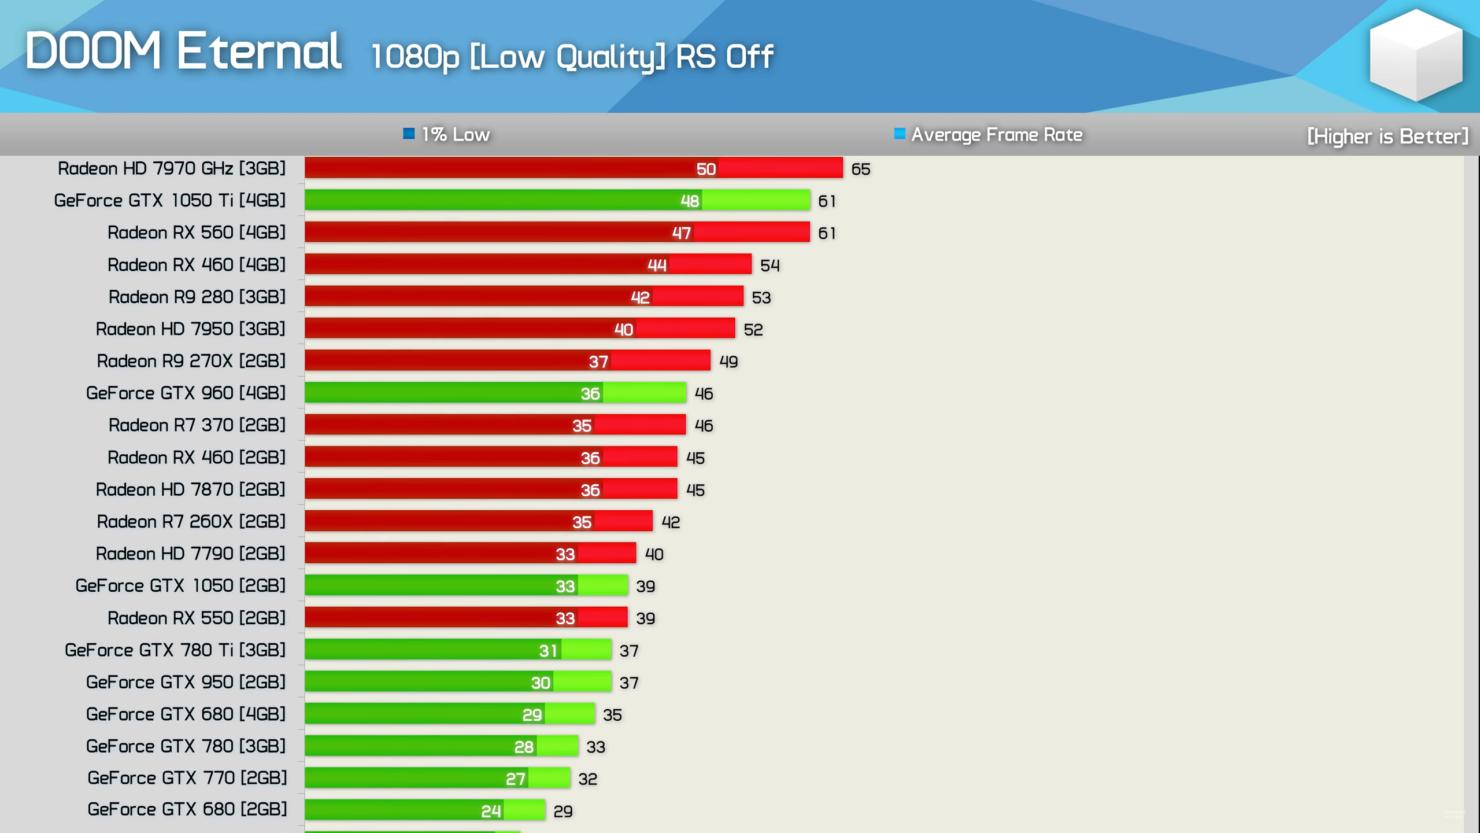 amd-radeon-nvidia-geforce-graphics-performance-benchmarks_doom-eternal_2